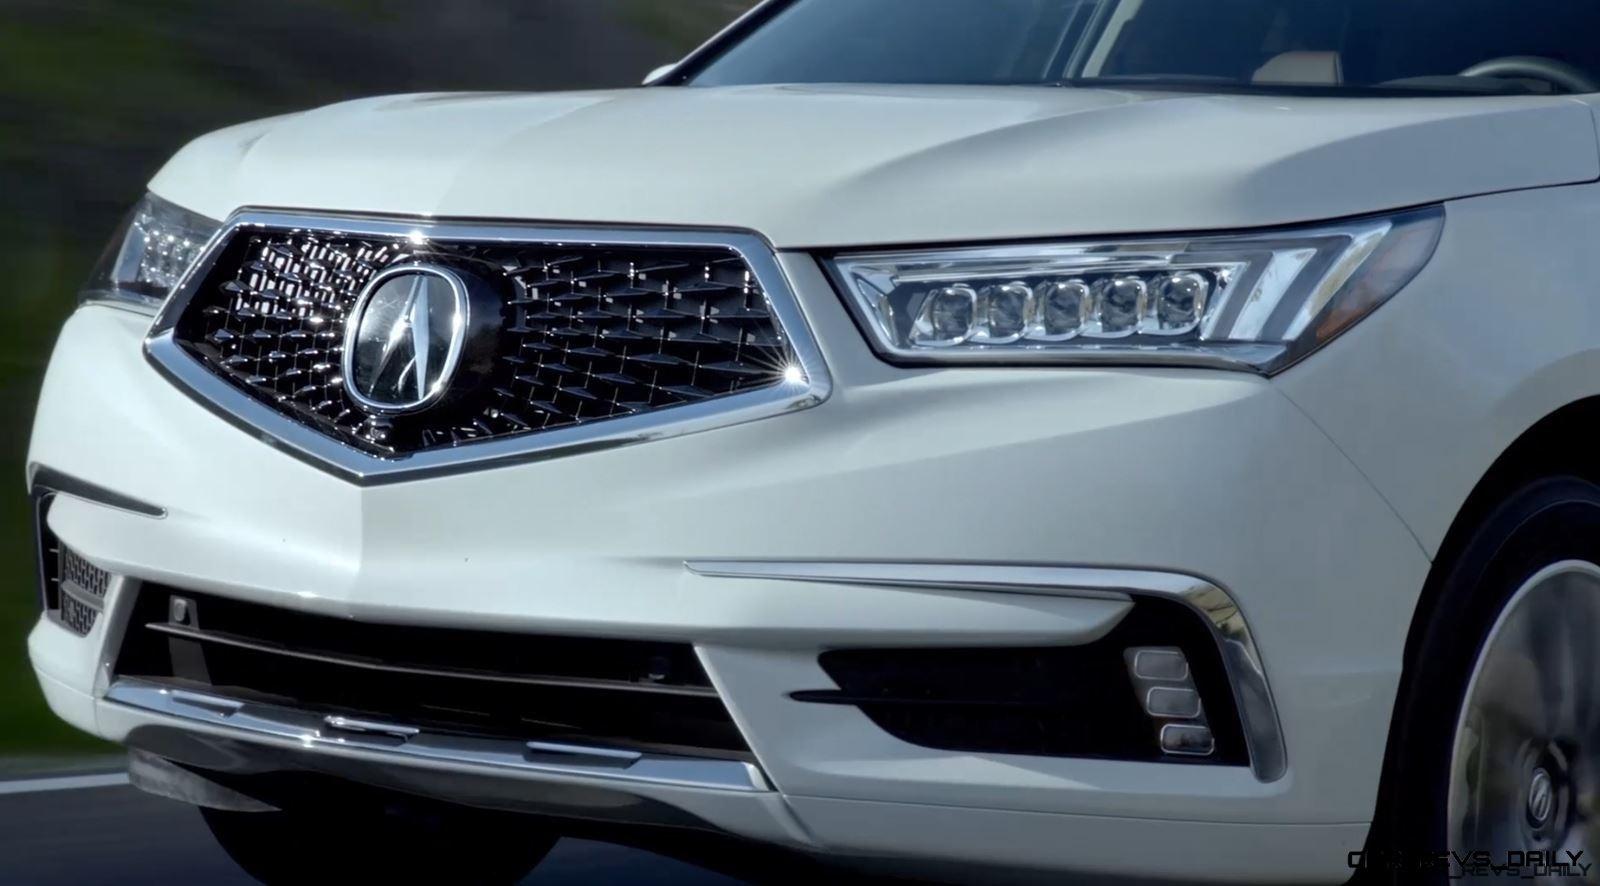 Acura MDX Sport Hybrid Leads Updated Range Images - Acura mdx led fog lights